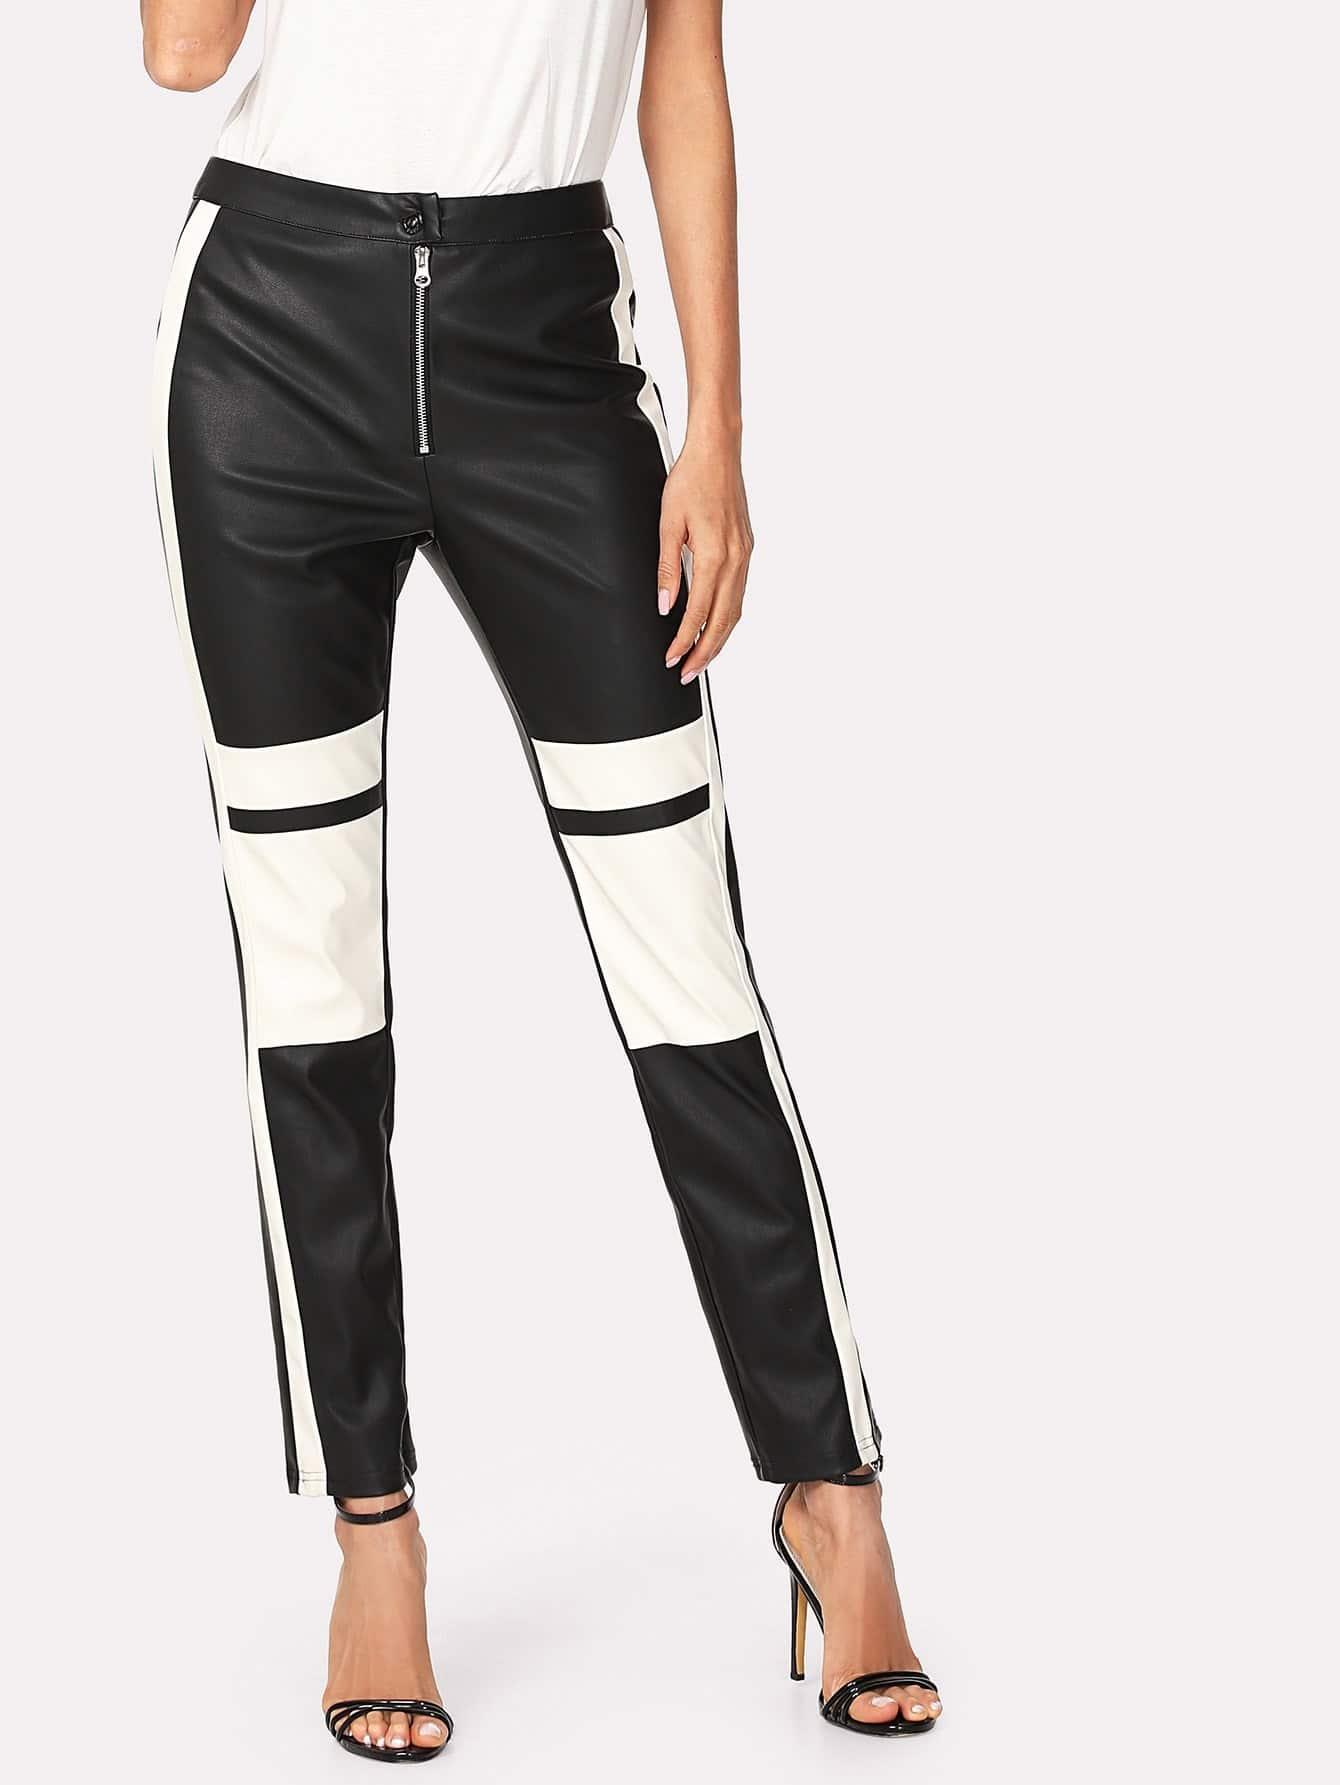 Two Tone Faux Leather Pants per se two tone snake skin pants